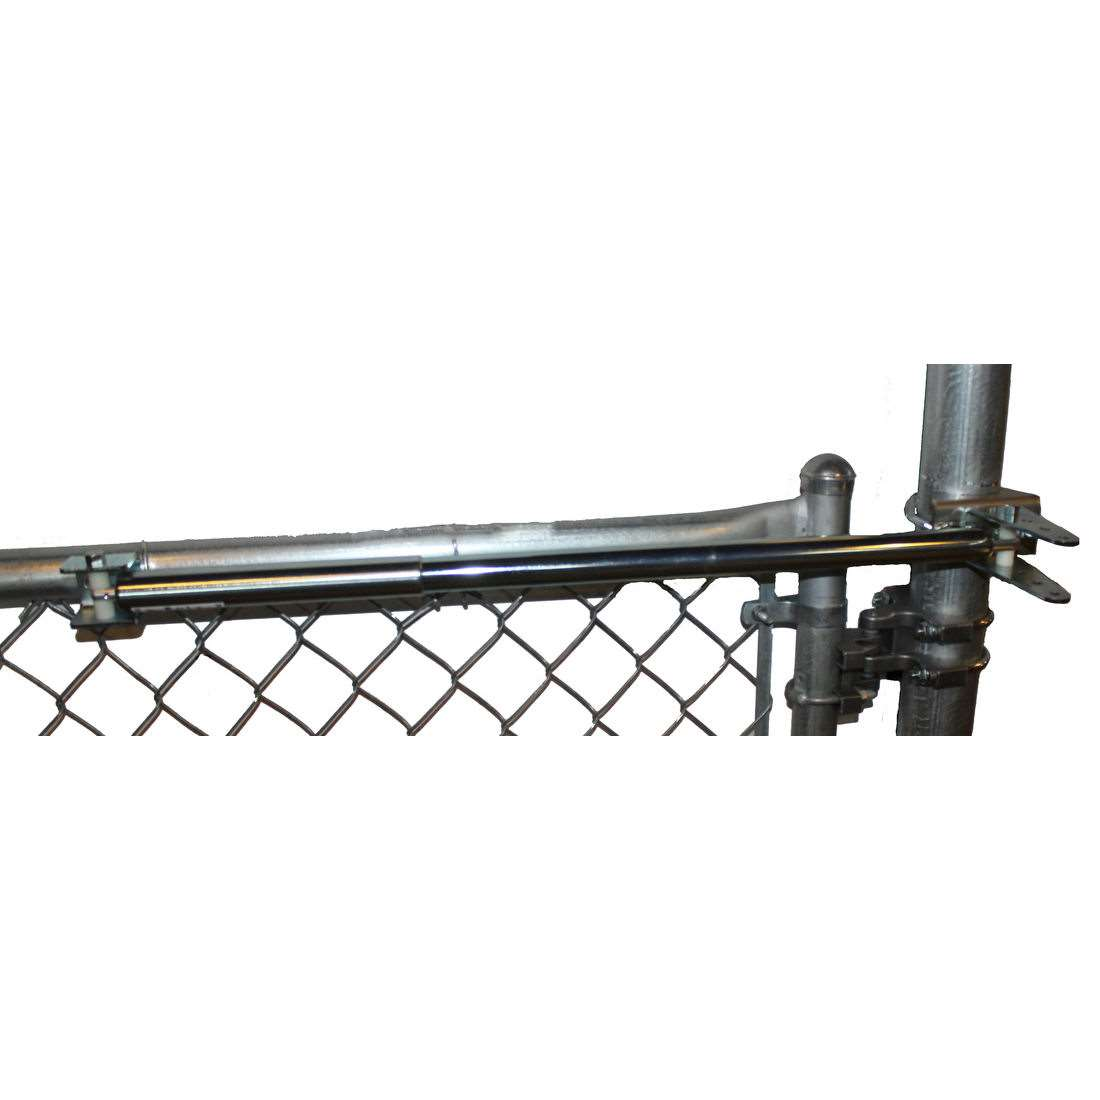 Lockey Tb Linx Chainlink Gate Mounting Kit